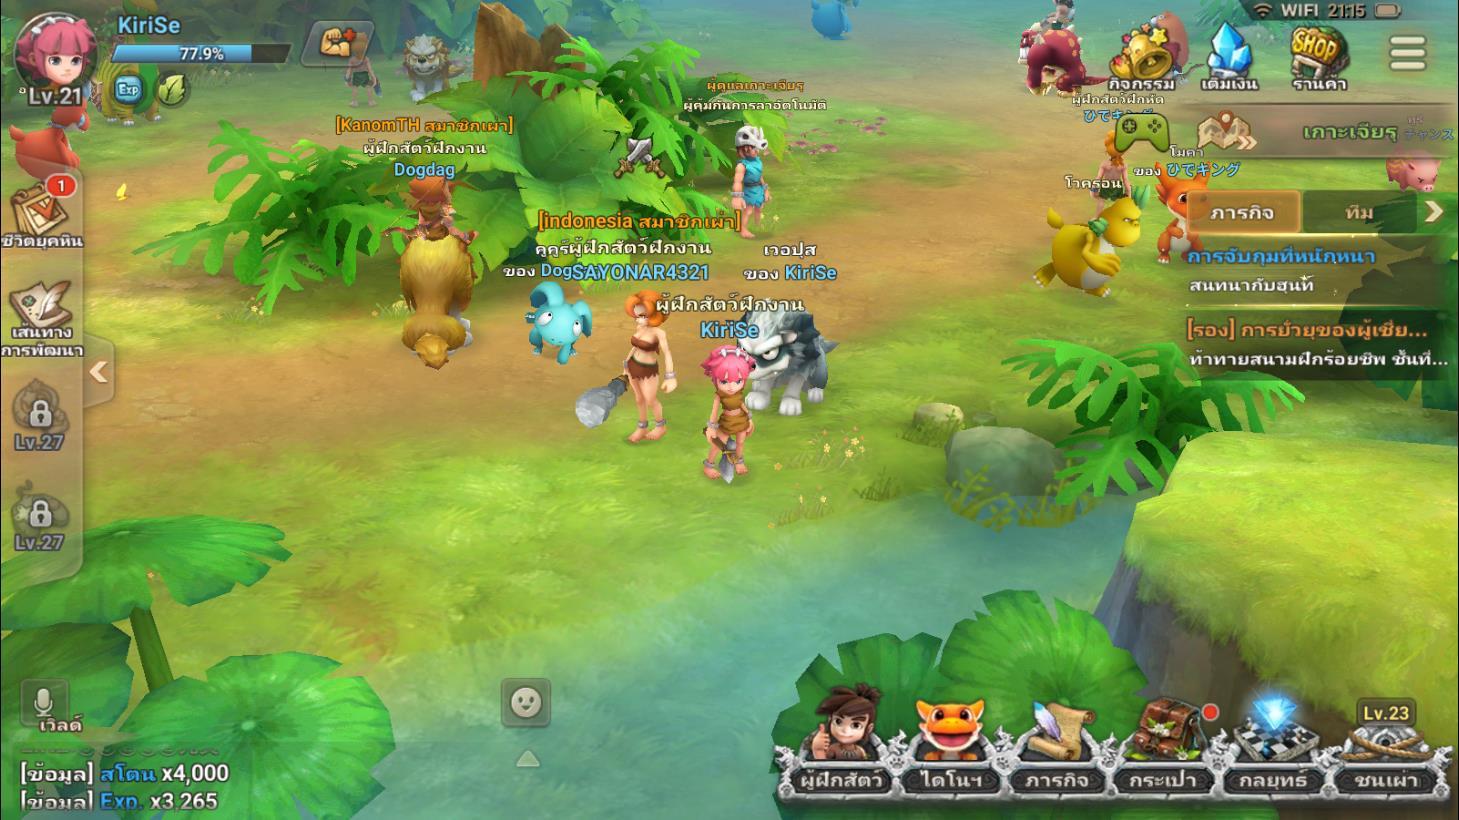 StoneAge World Screenshot 2020.06.24 19.16.17